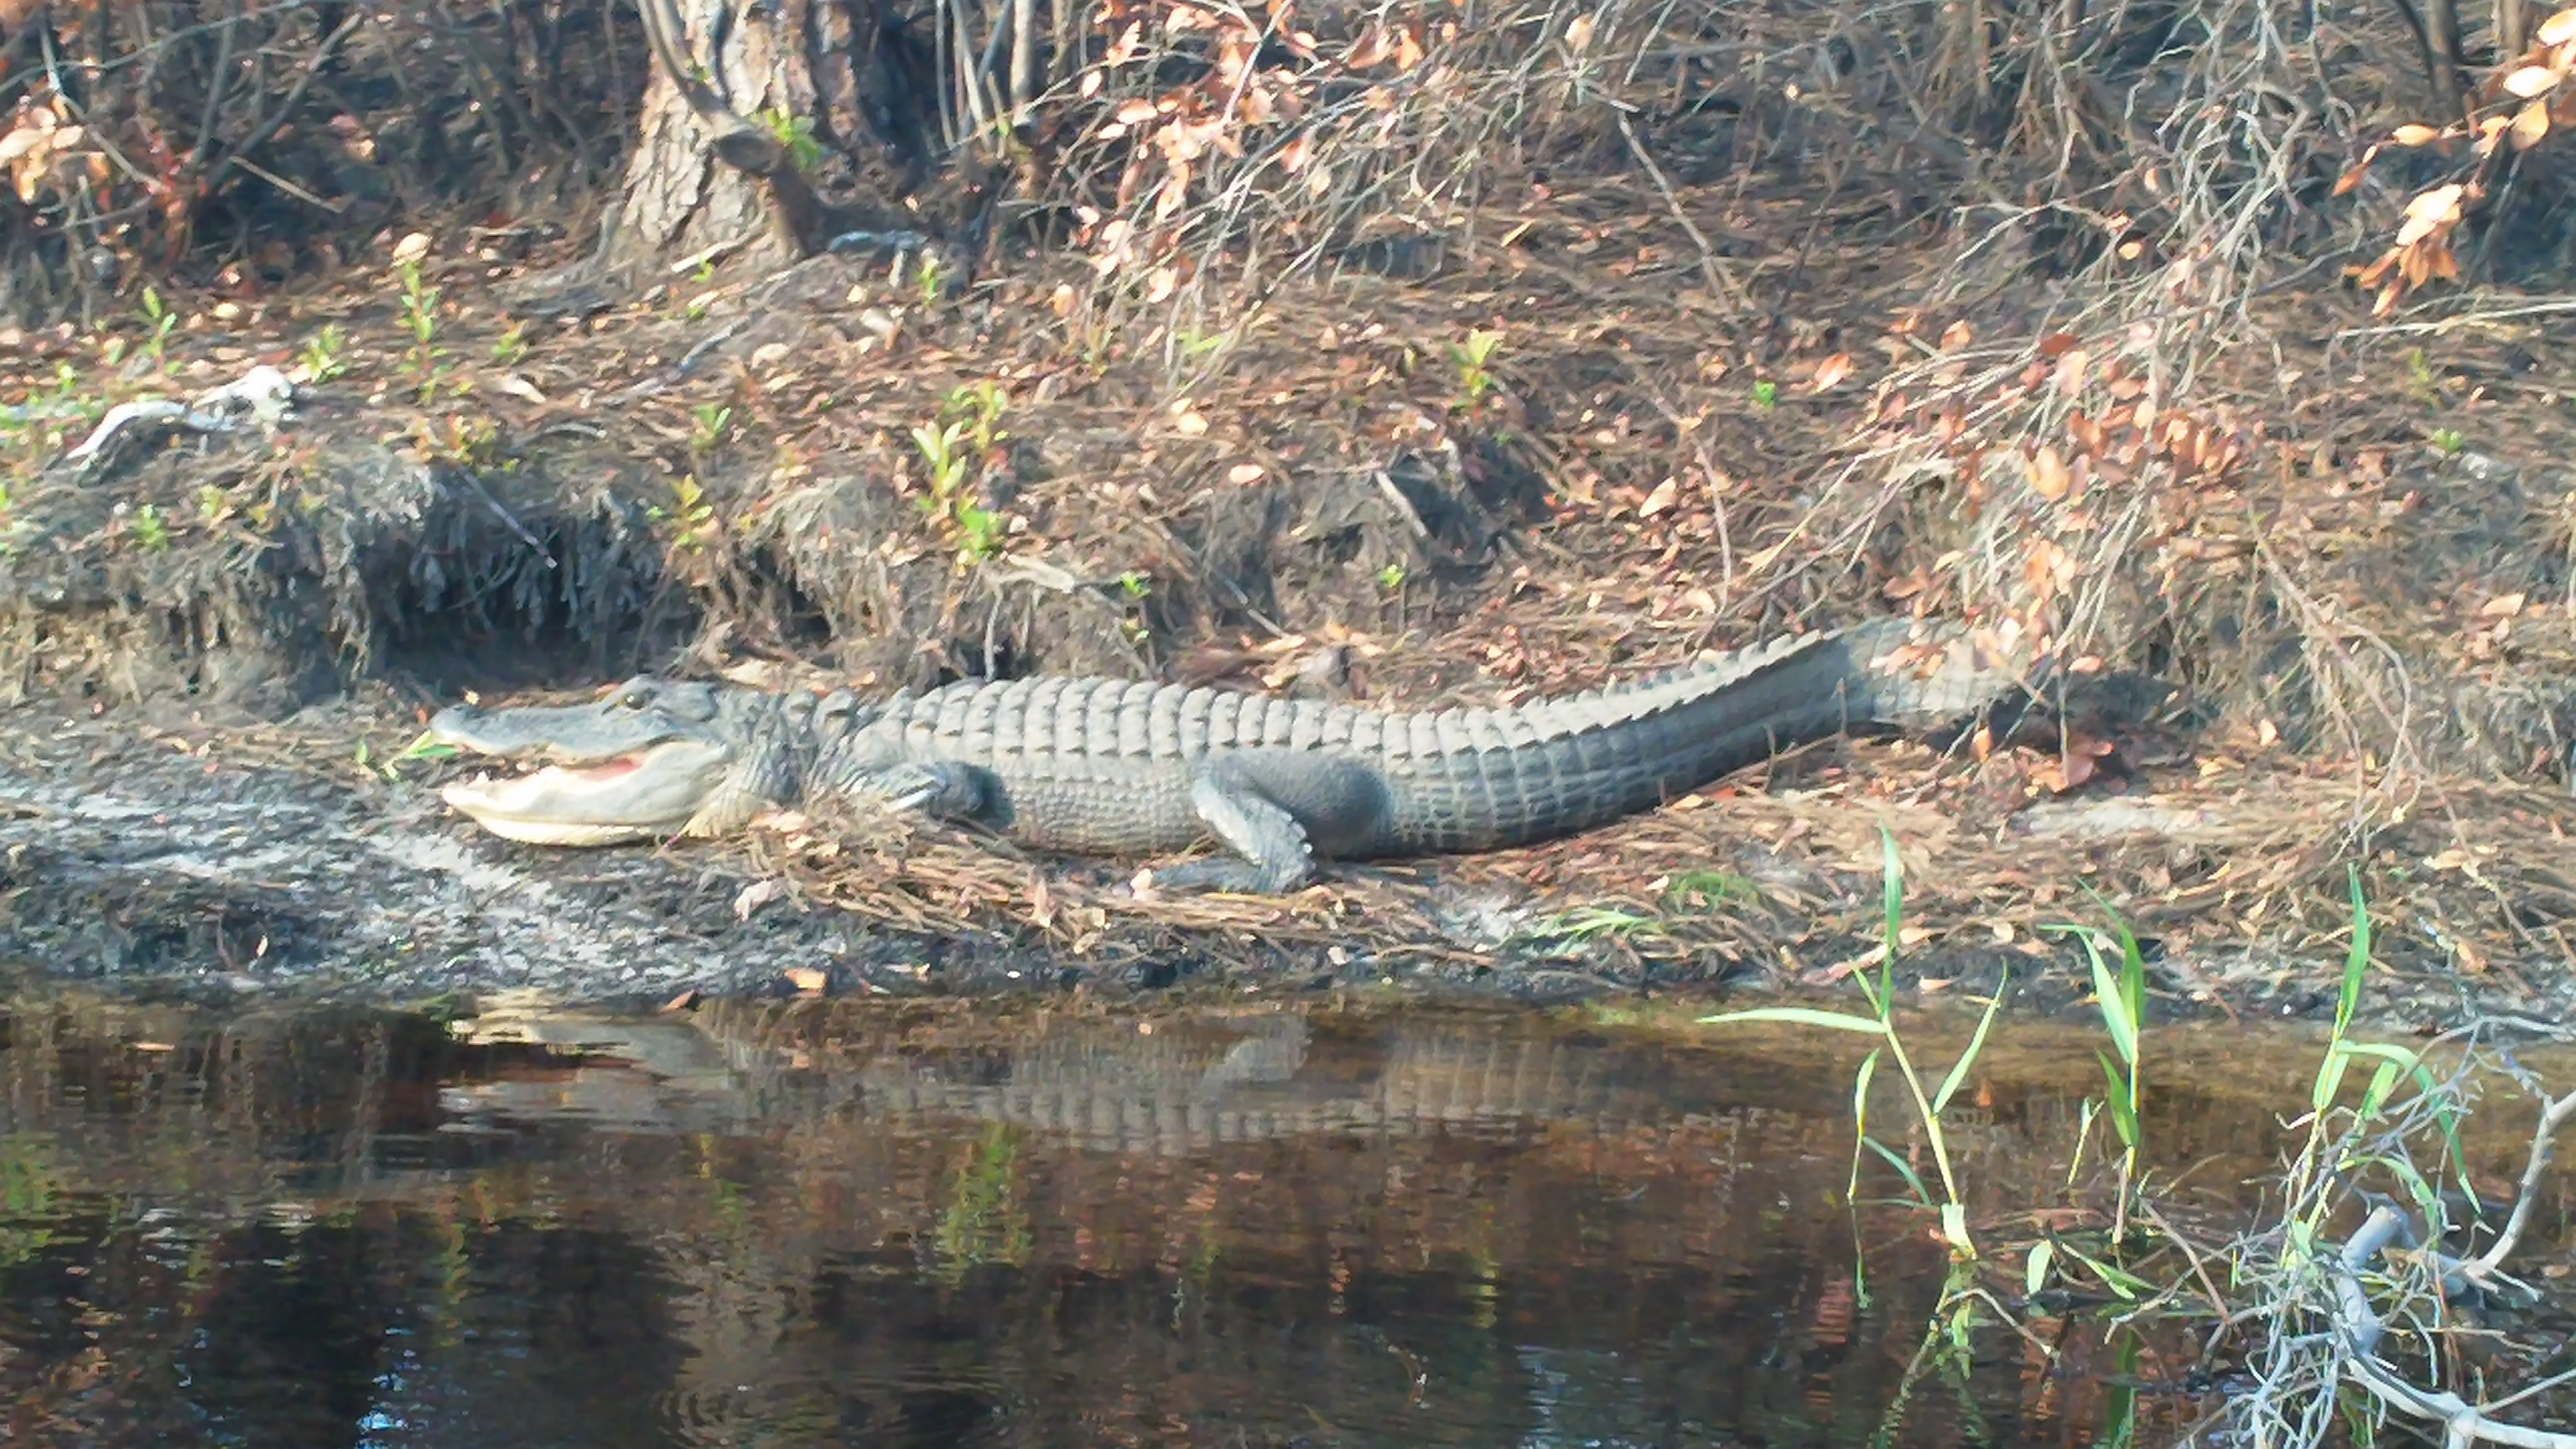 Okefenokee National Wildlife Refuge